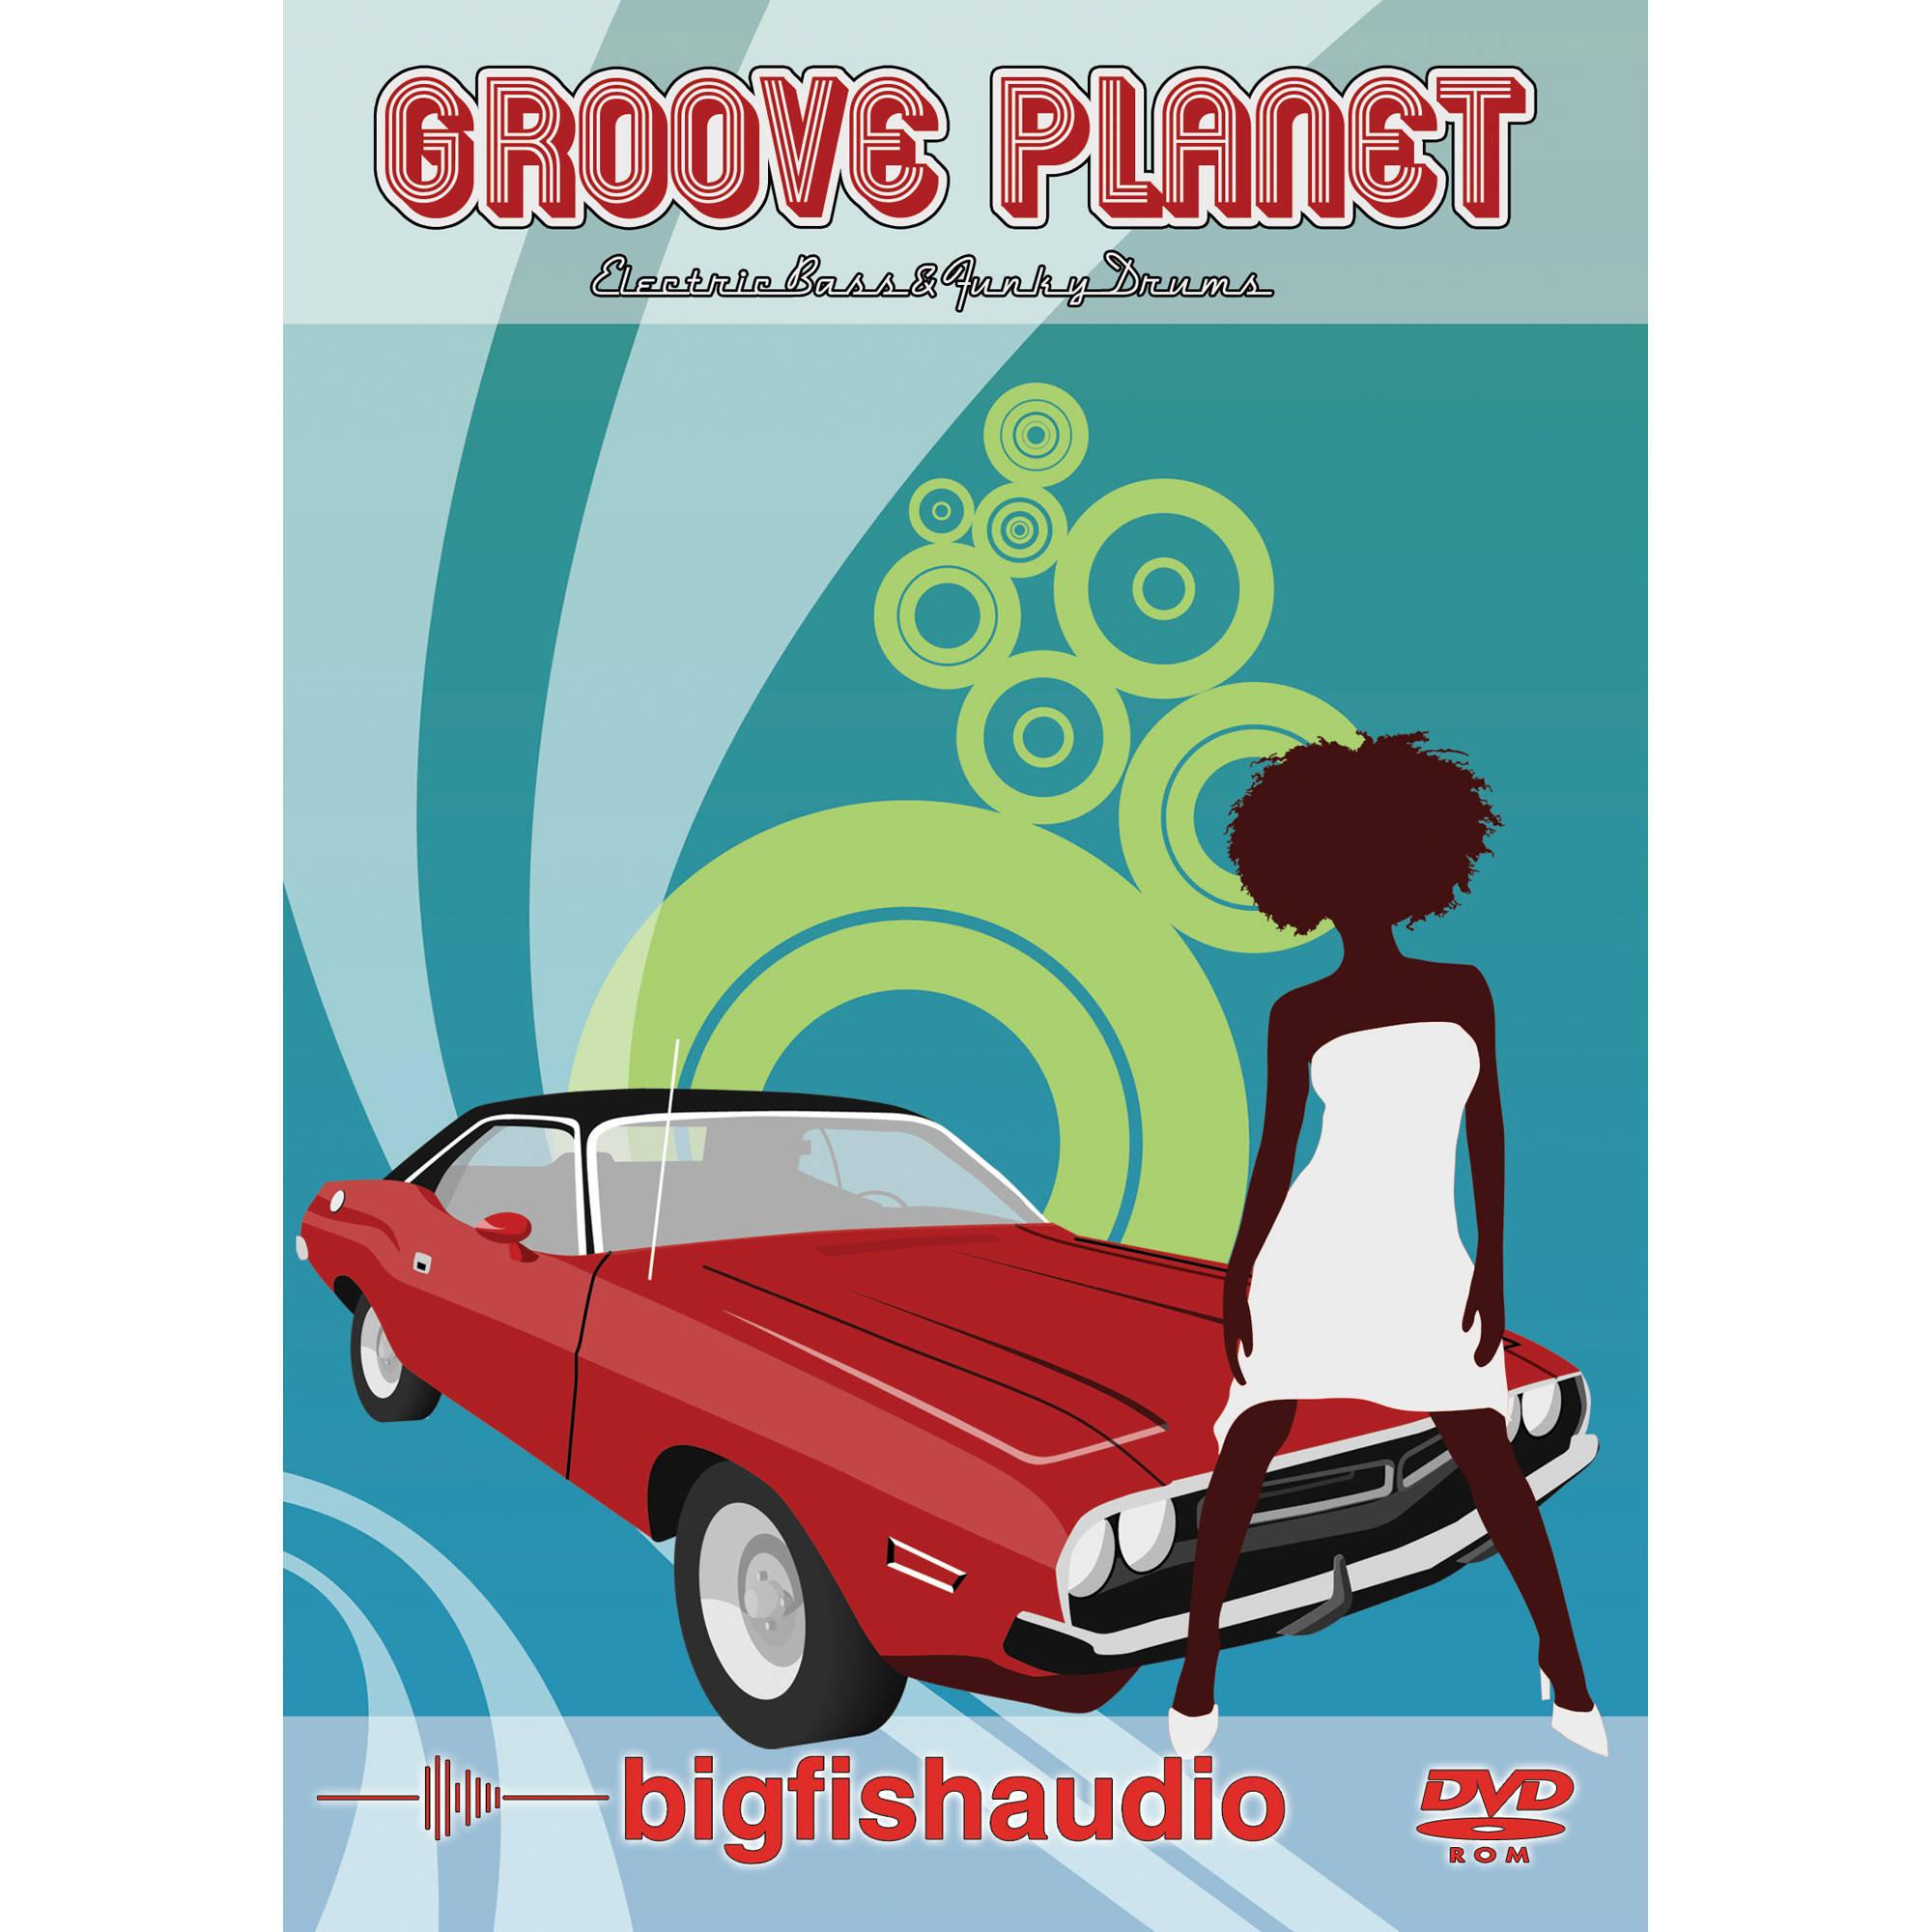 Big fish audio groove planet dvd gvpt1 orwx b h photo video for Big fish audio